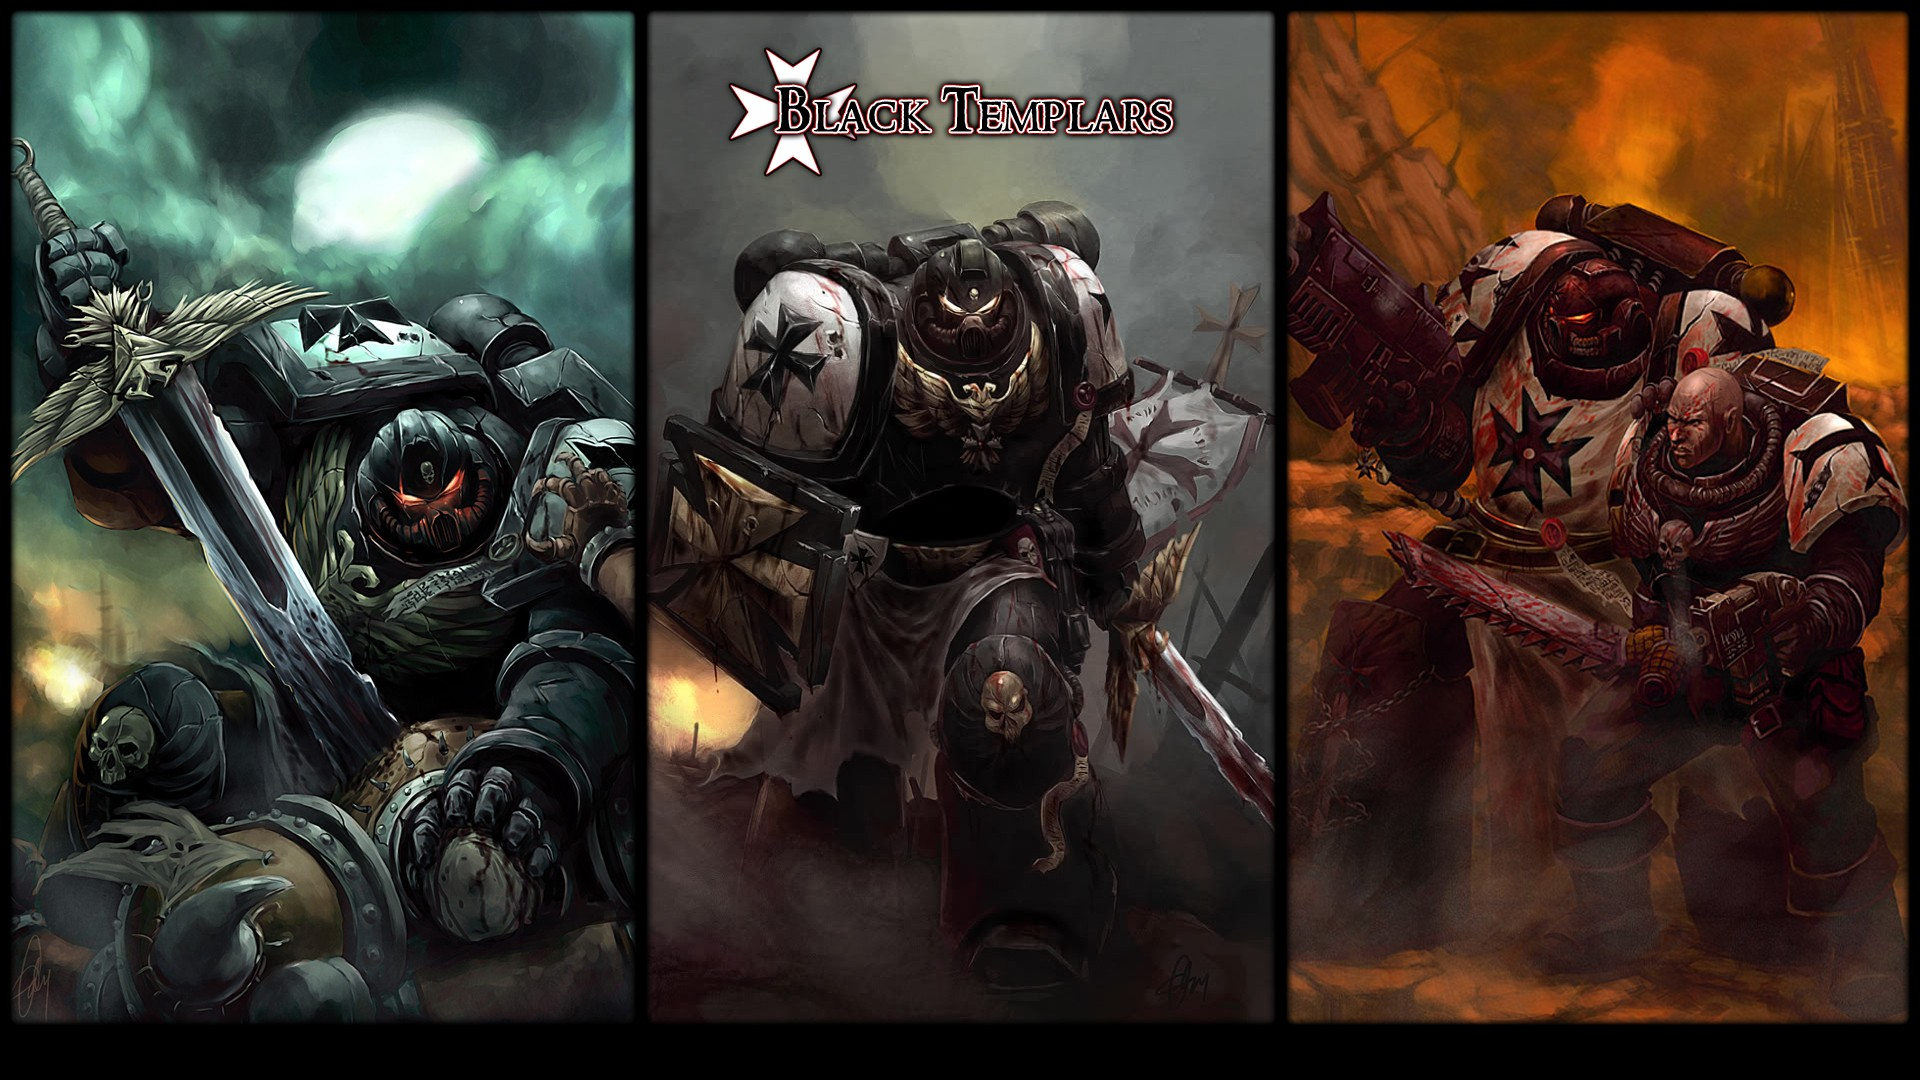 47 Warhammer 40k Hd Wallpapers On Wallpapersafari